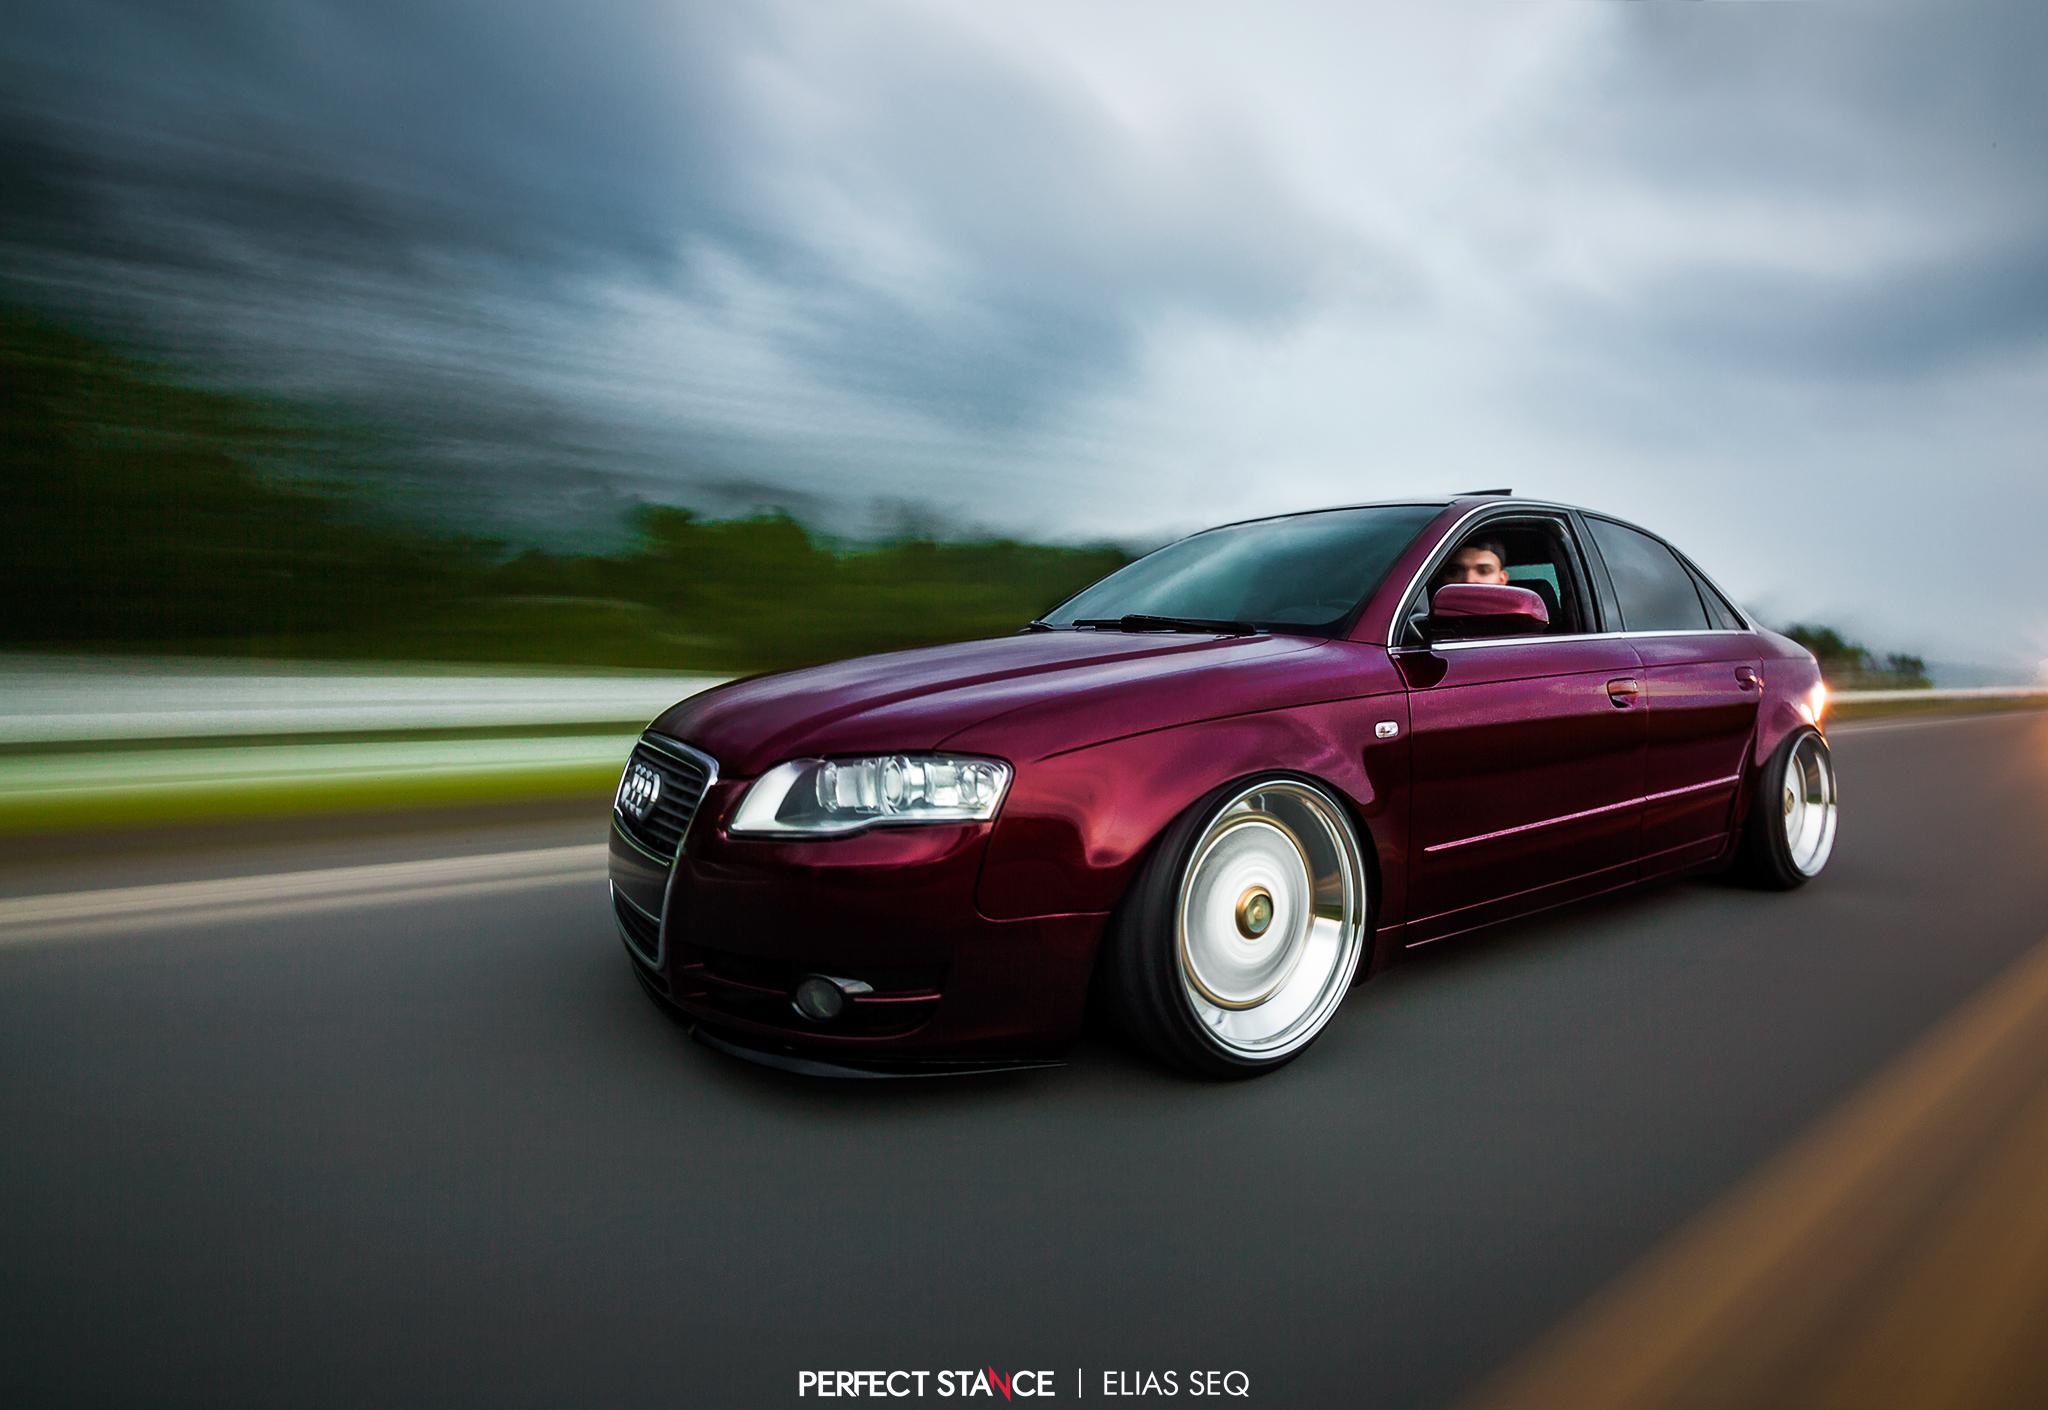 Wallpaper Audi Bbs Stance Driving Performance Car Fitment